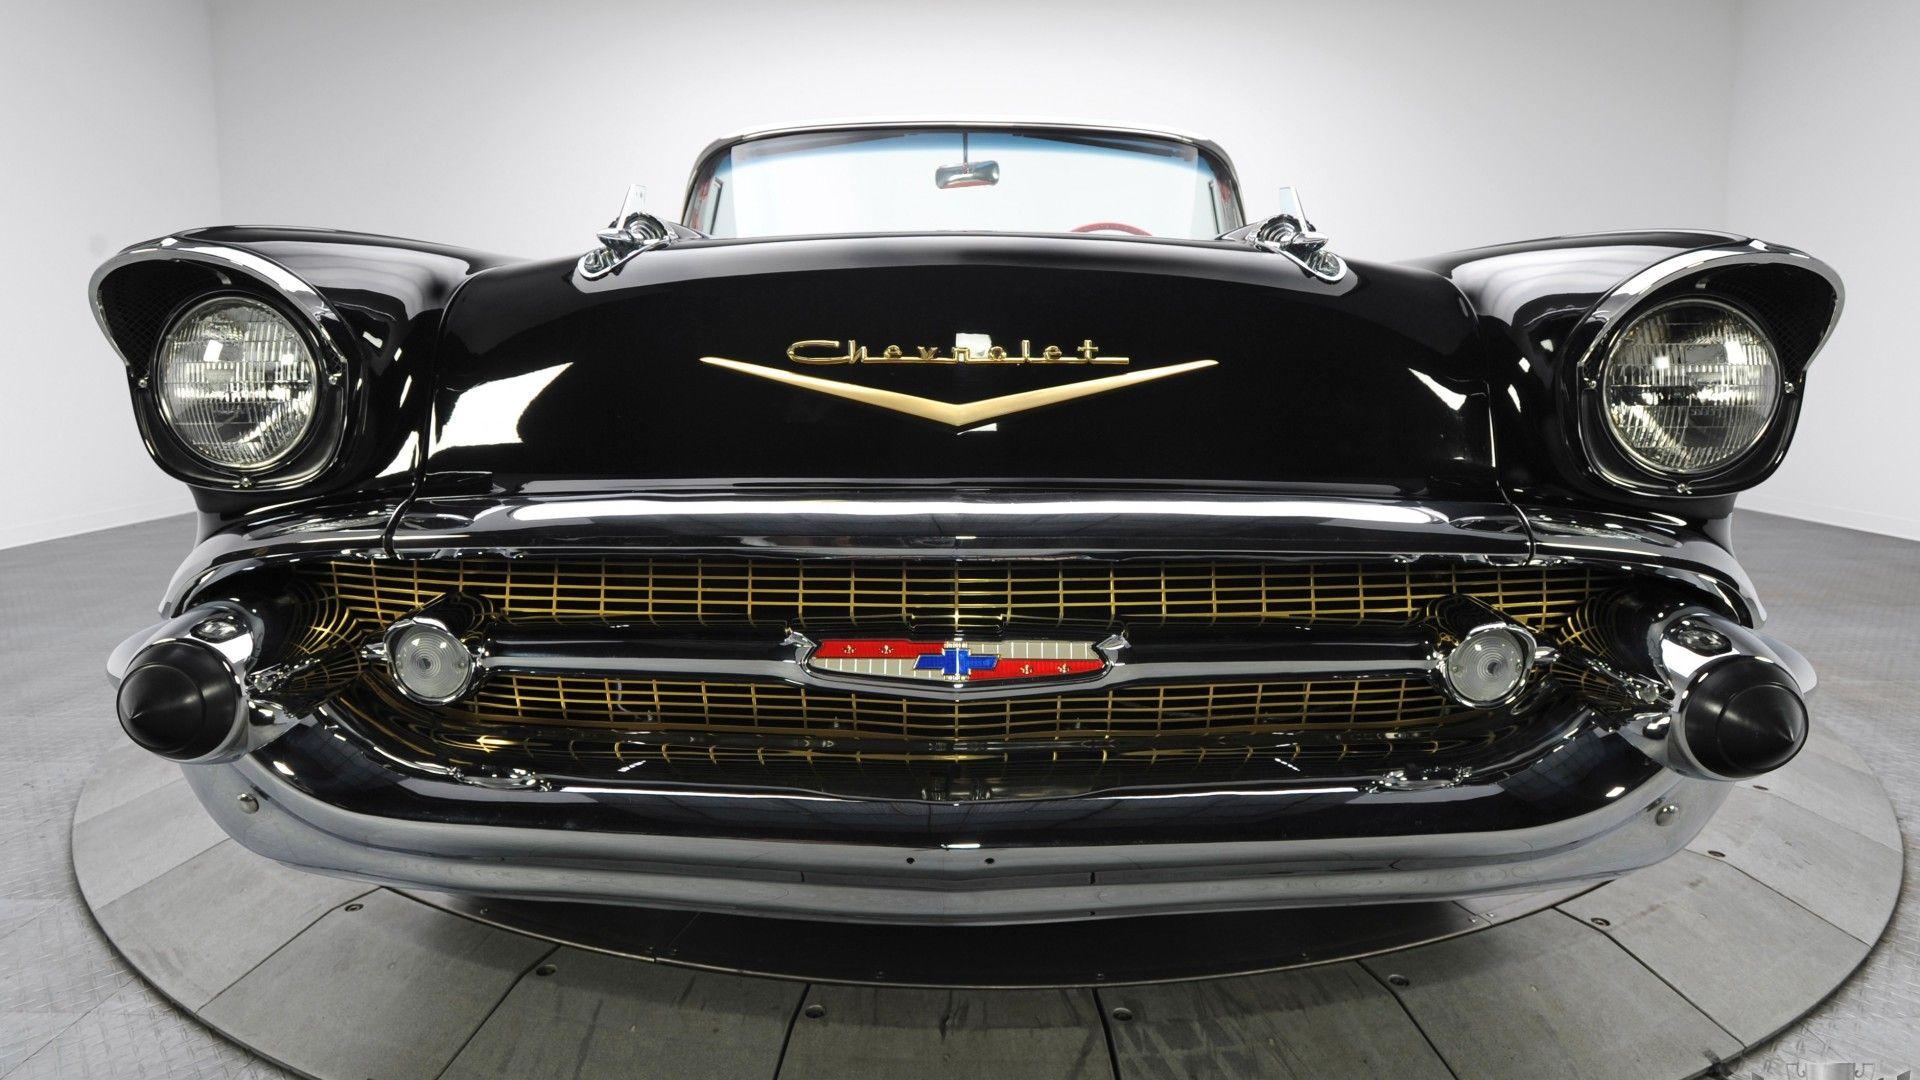 Classic Car Wallpaper 1920x1080 Cars Wallpapers 7984 Ilikewalls Com Chevy Chevrolet Classic Cars Custom Classic Cars